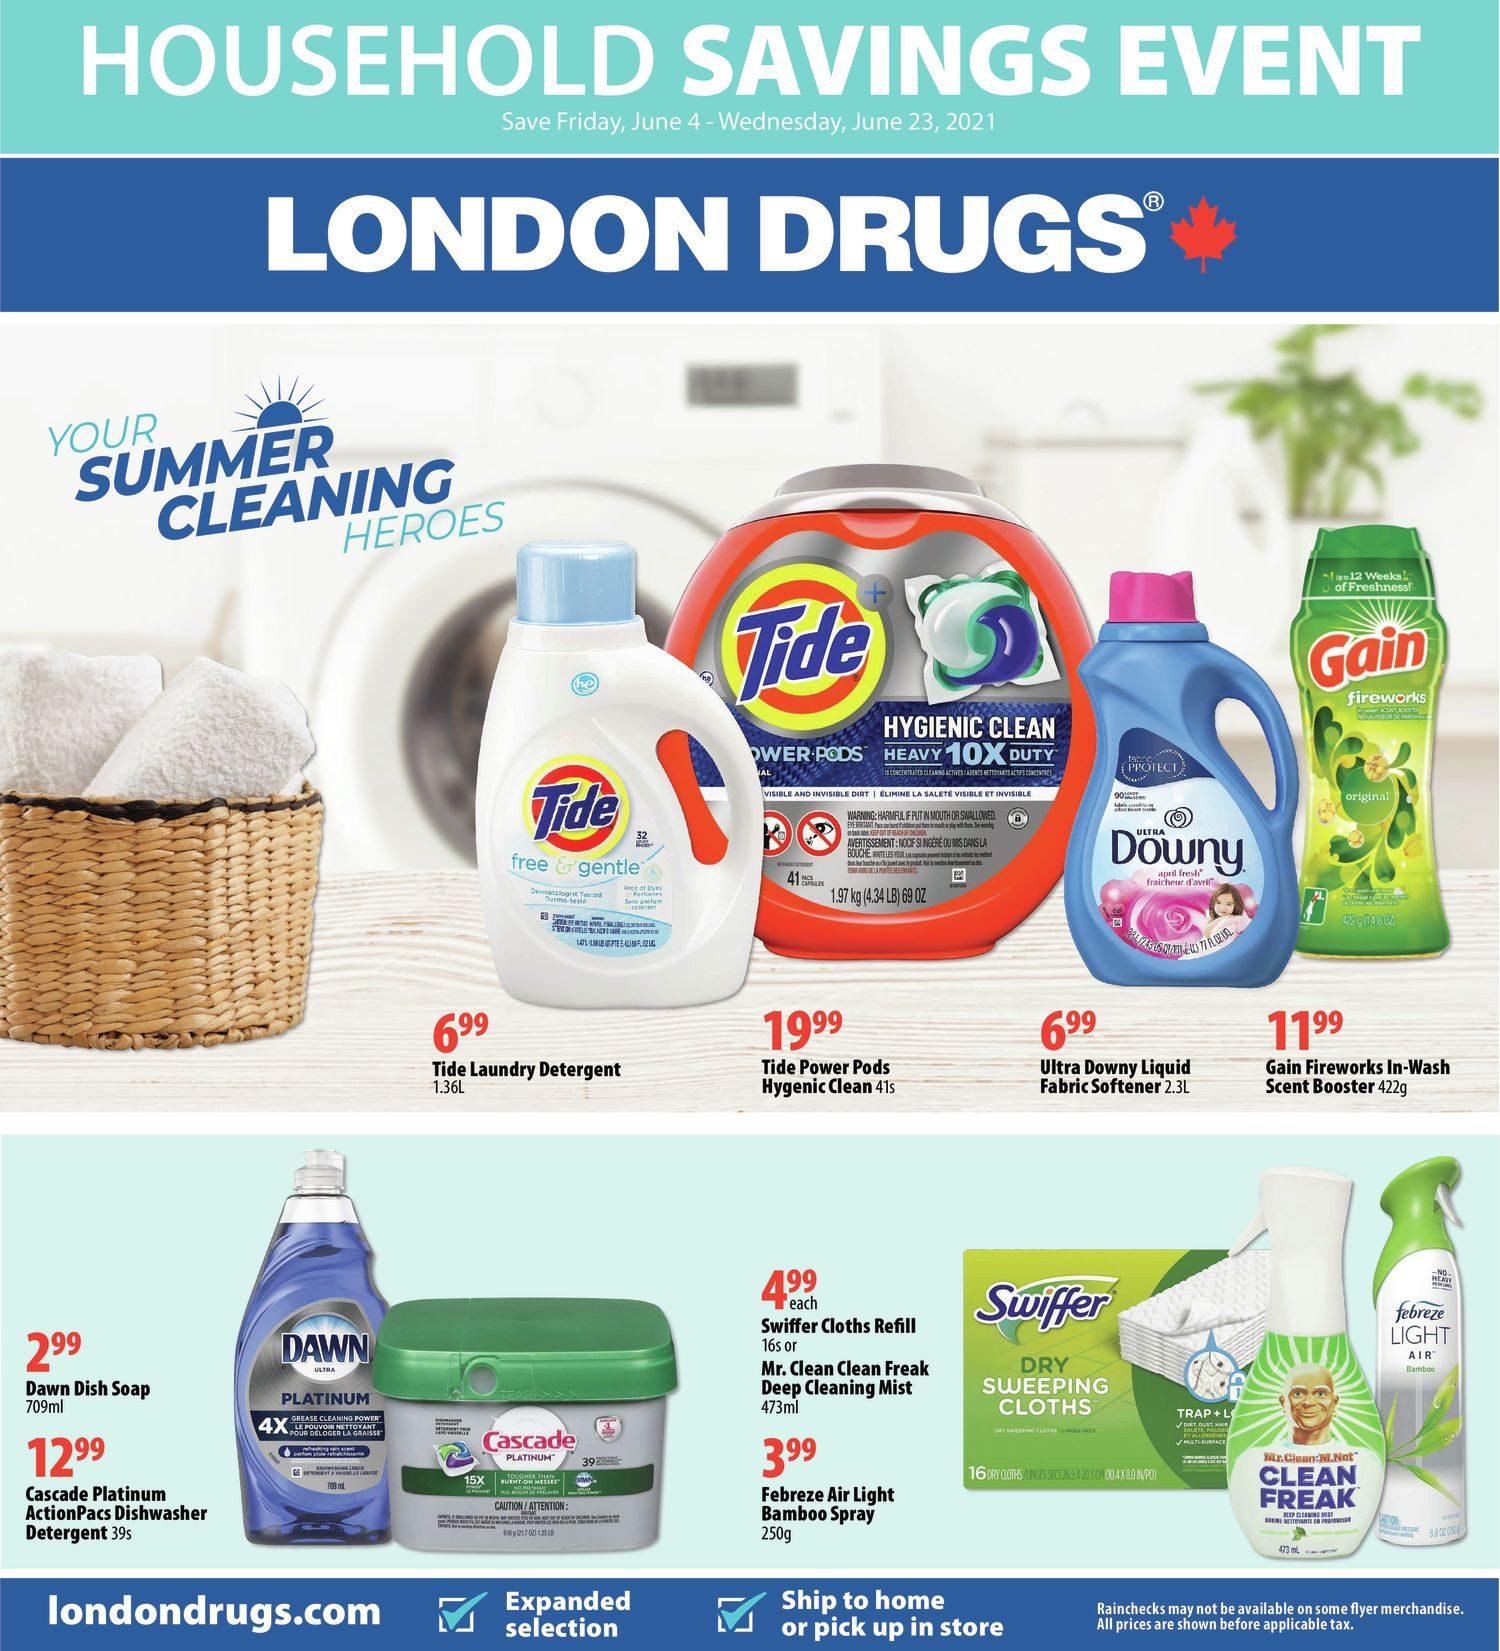 London Drugs - Household Savings Event